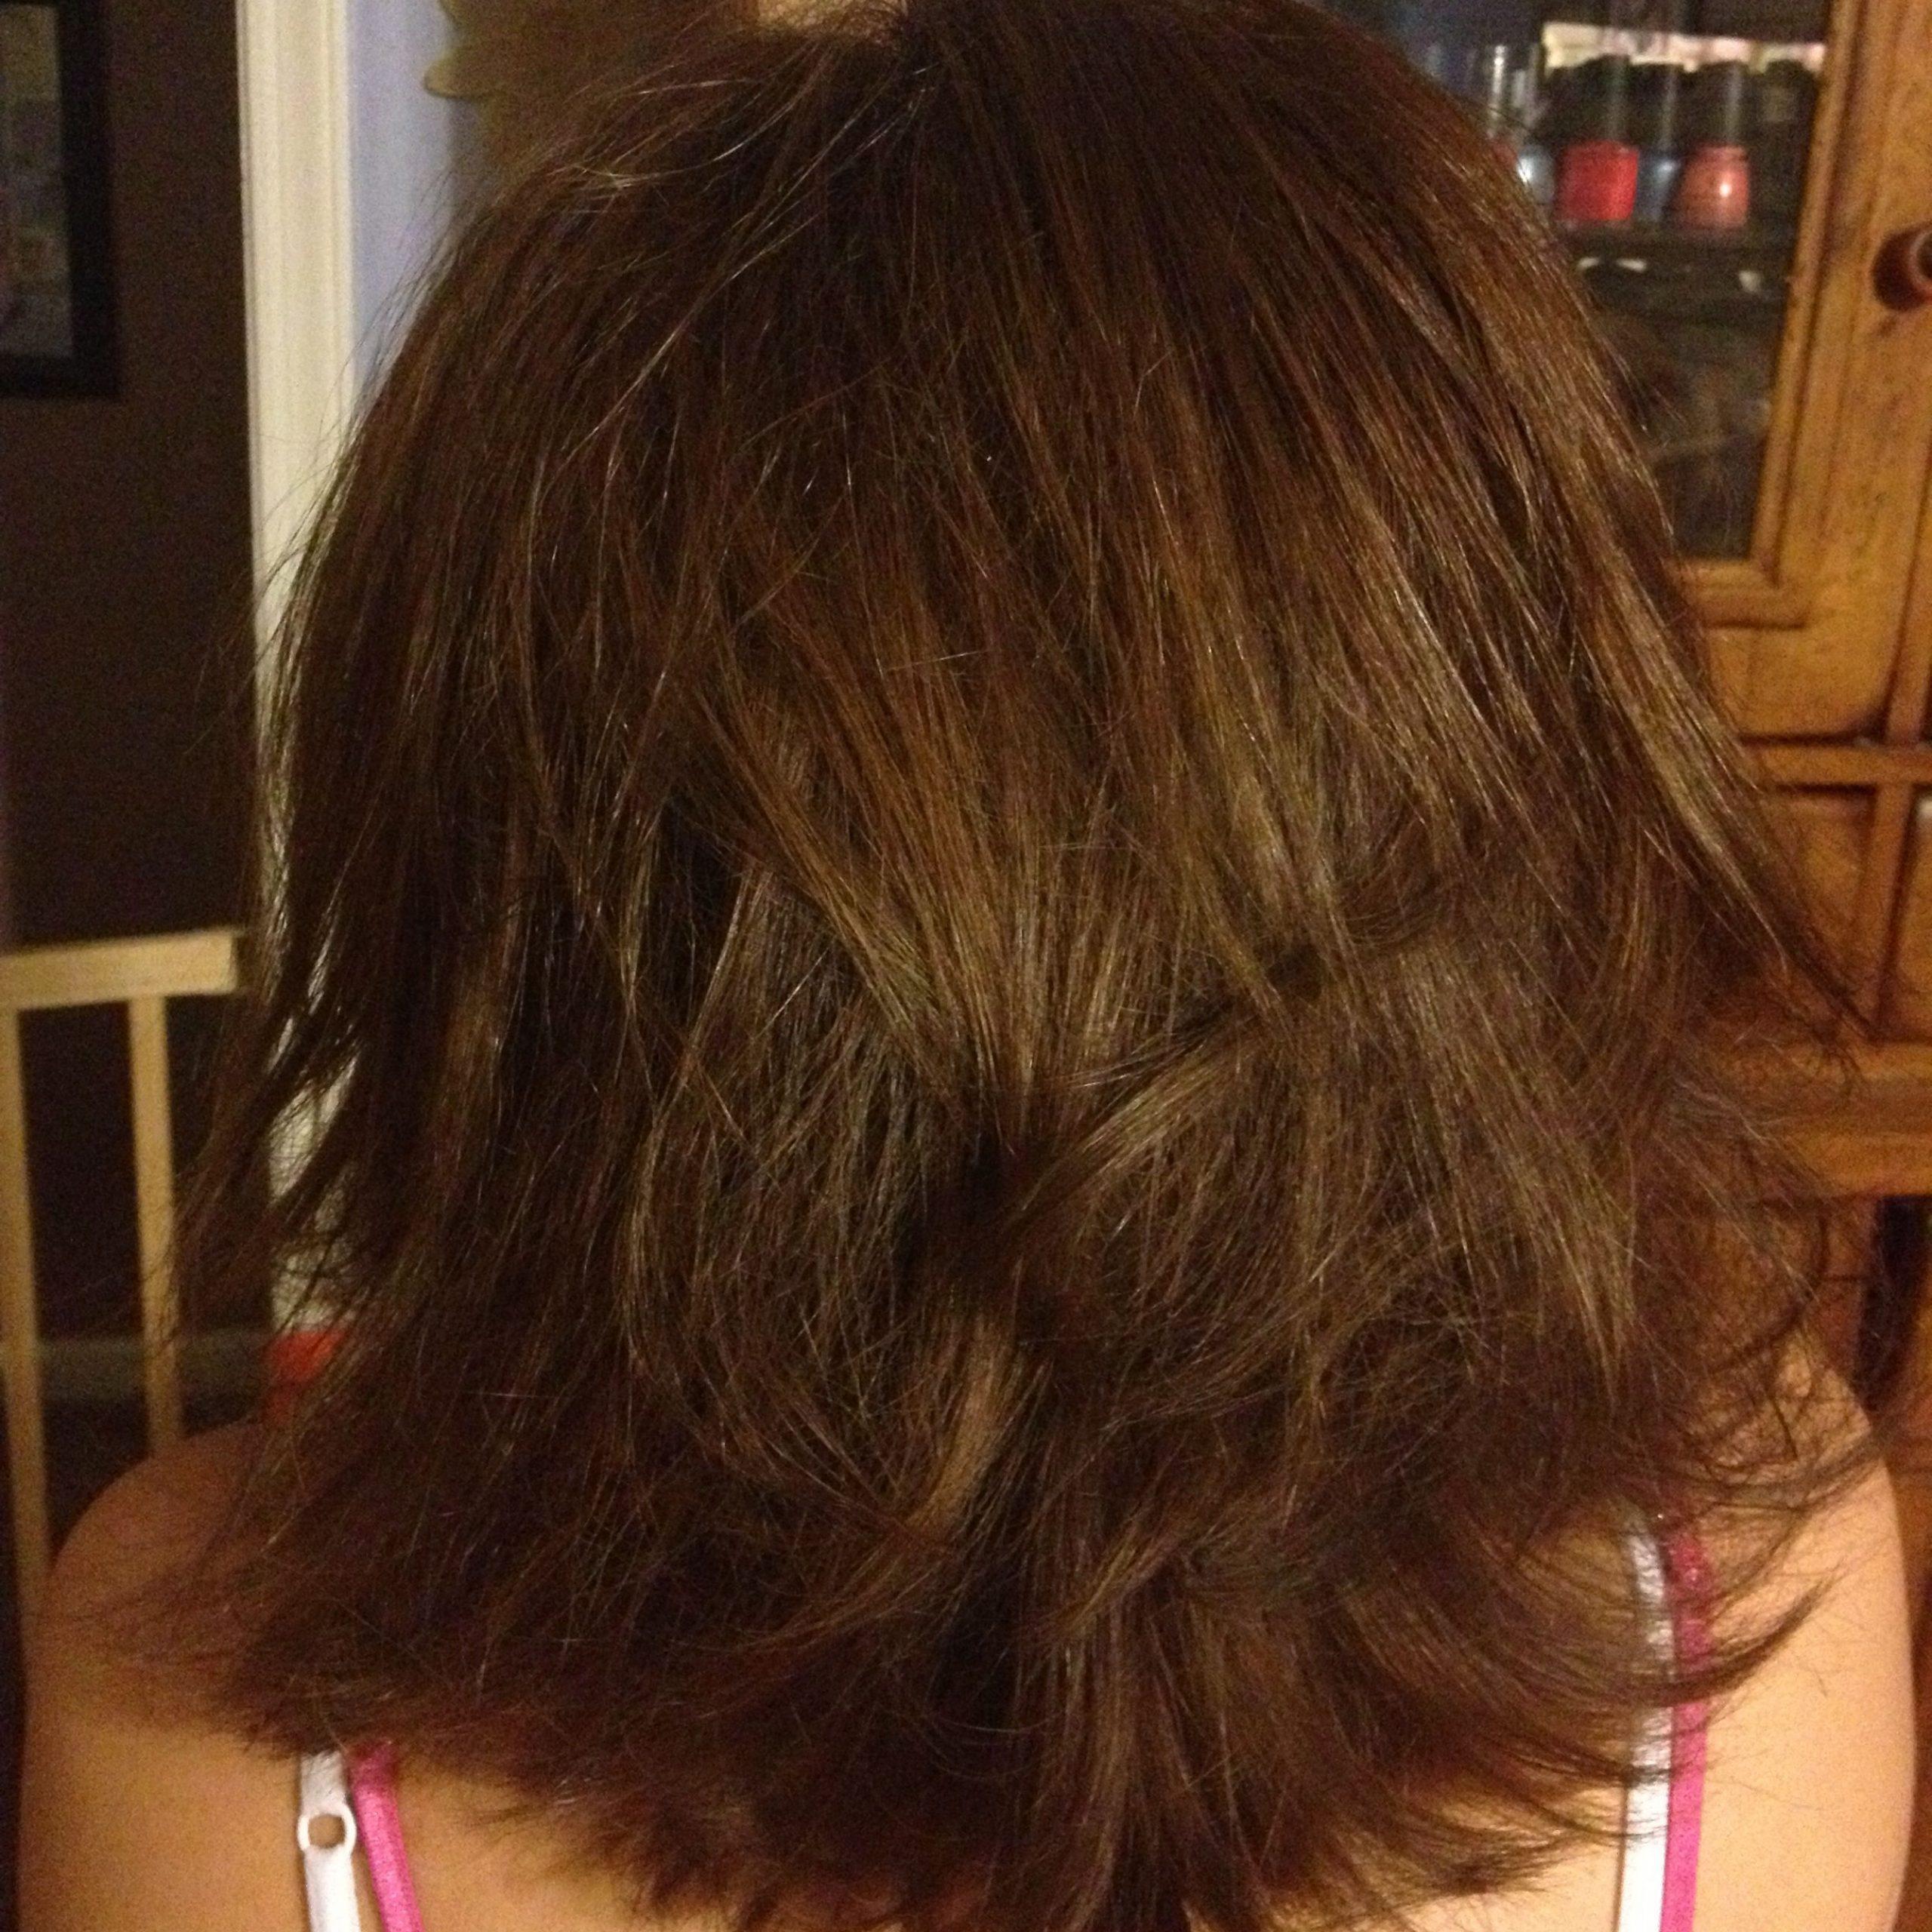 Razored Layered Bob Medium Length Hair (View 7 of 20)